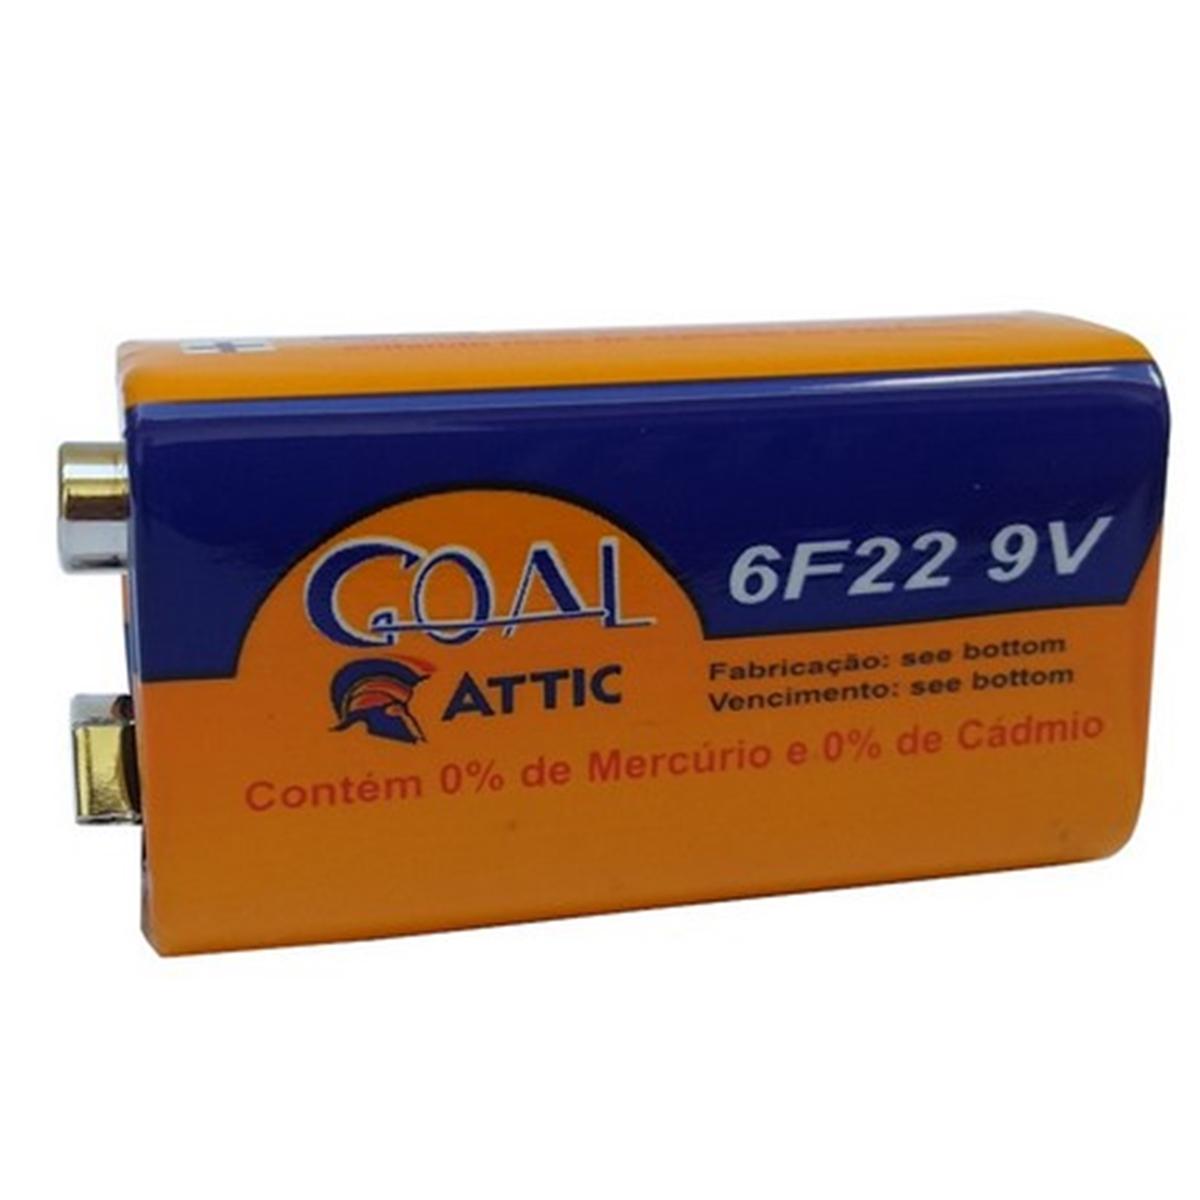 Kit 30 Bateria 9V Multimetro Controle Lanterna Brinquedos Pilha Goal Attic - GL-9V-3